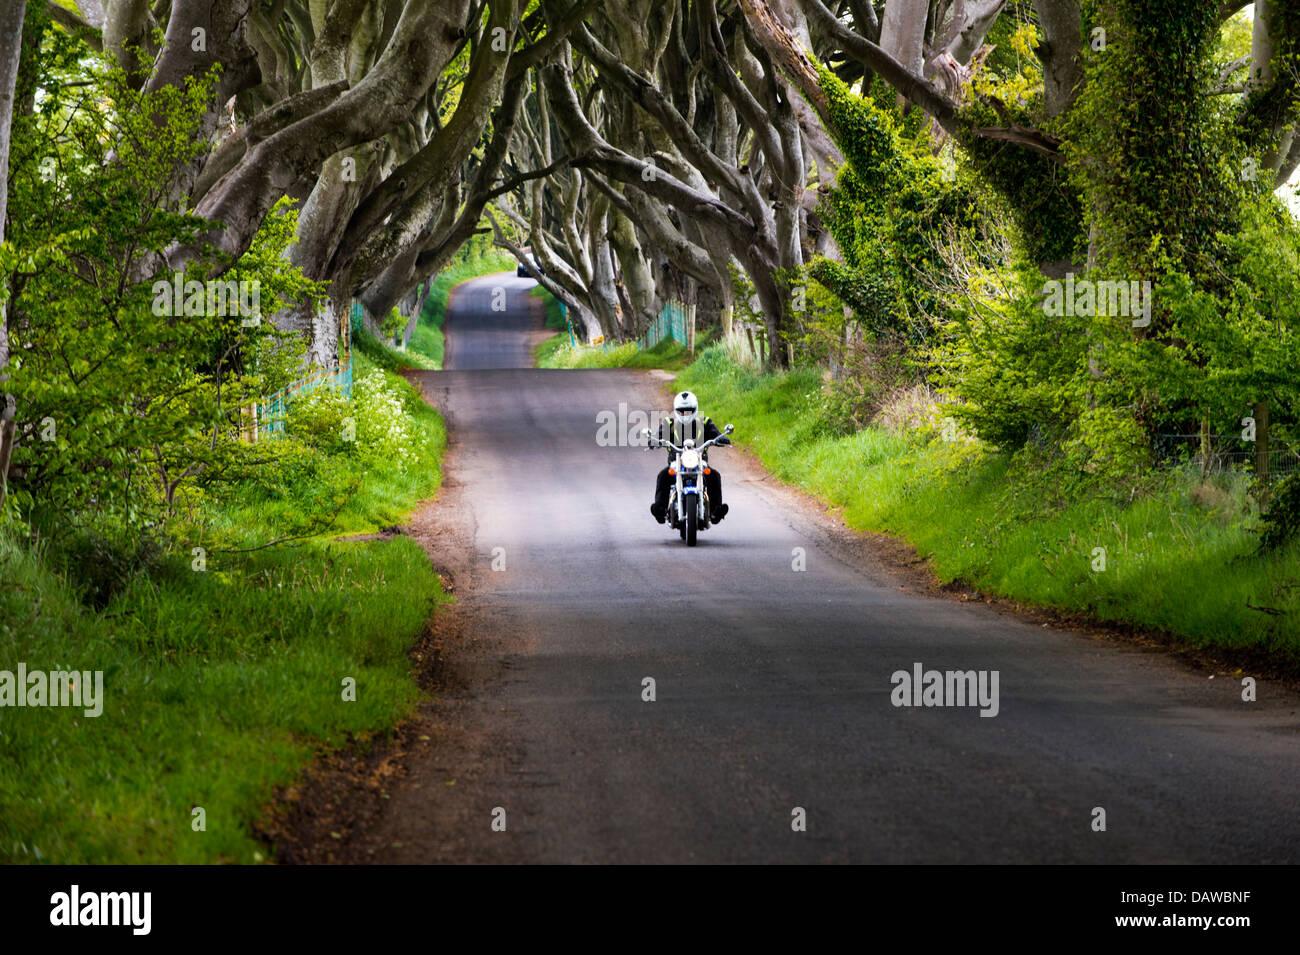 Motorcycle travels through the Dark Hedges, Bregagh Road, Ballymoney, County Antrim, Northern Ireland, UK - Stock Image